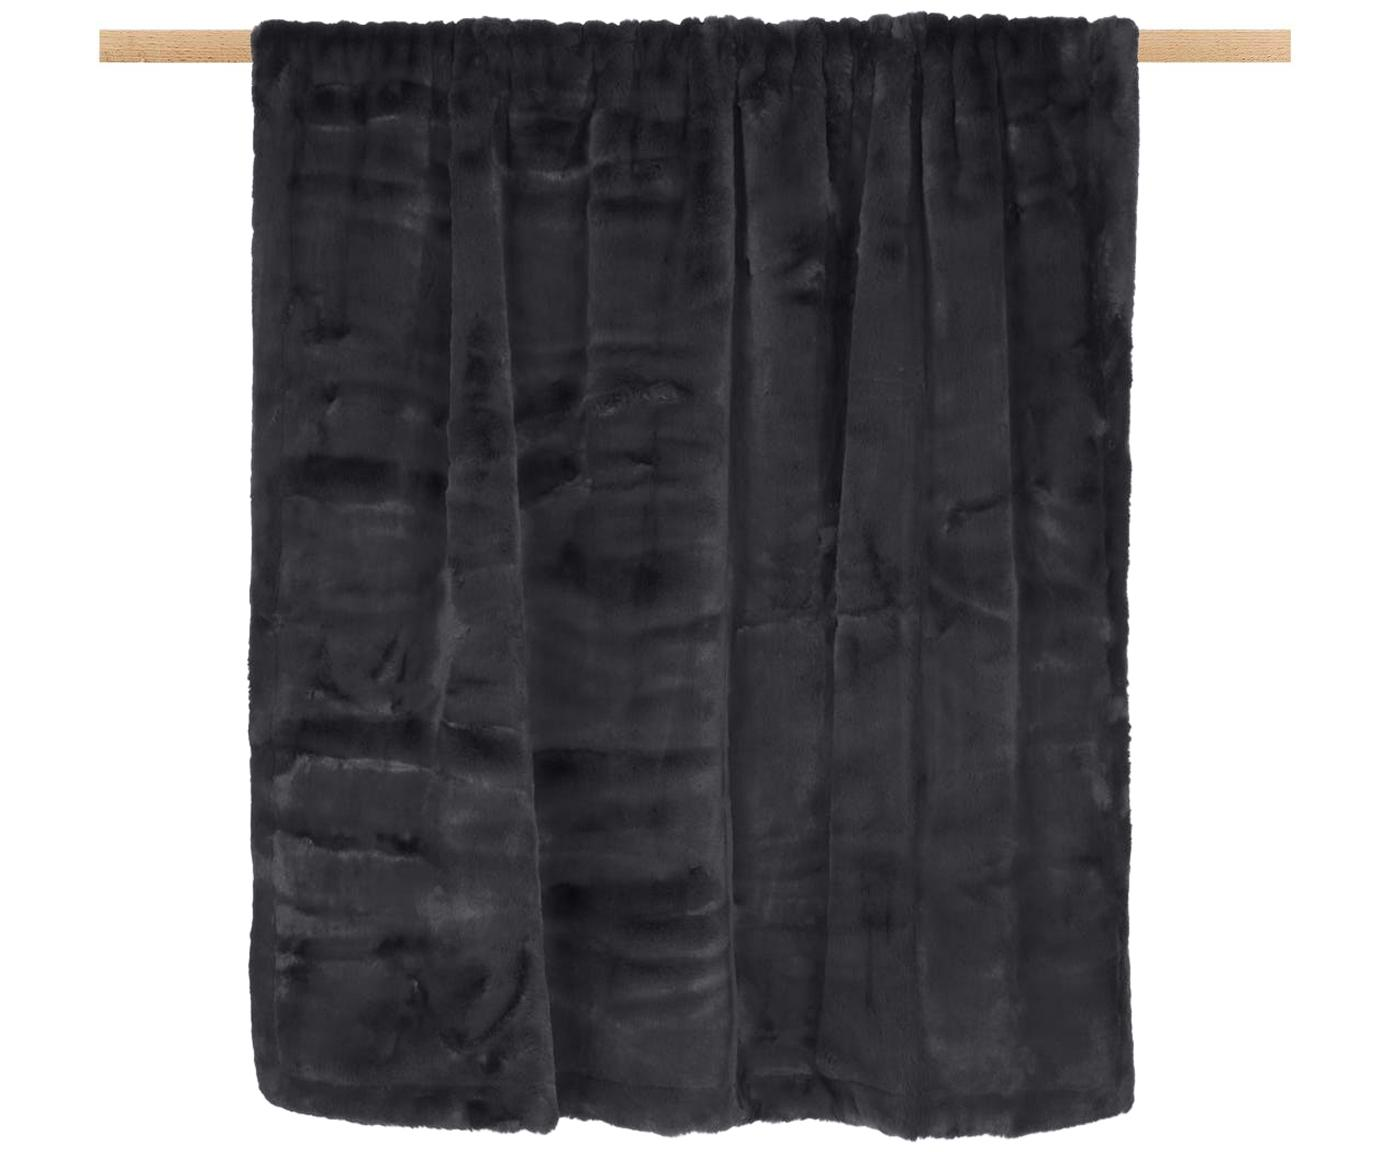 Plaid in ecopelliccia Mette, Retro: 100% poliestere, Grigio scuro, Larg. 150 x Lung. 200 cm